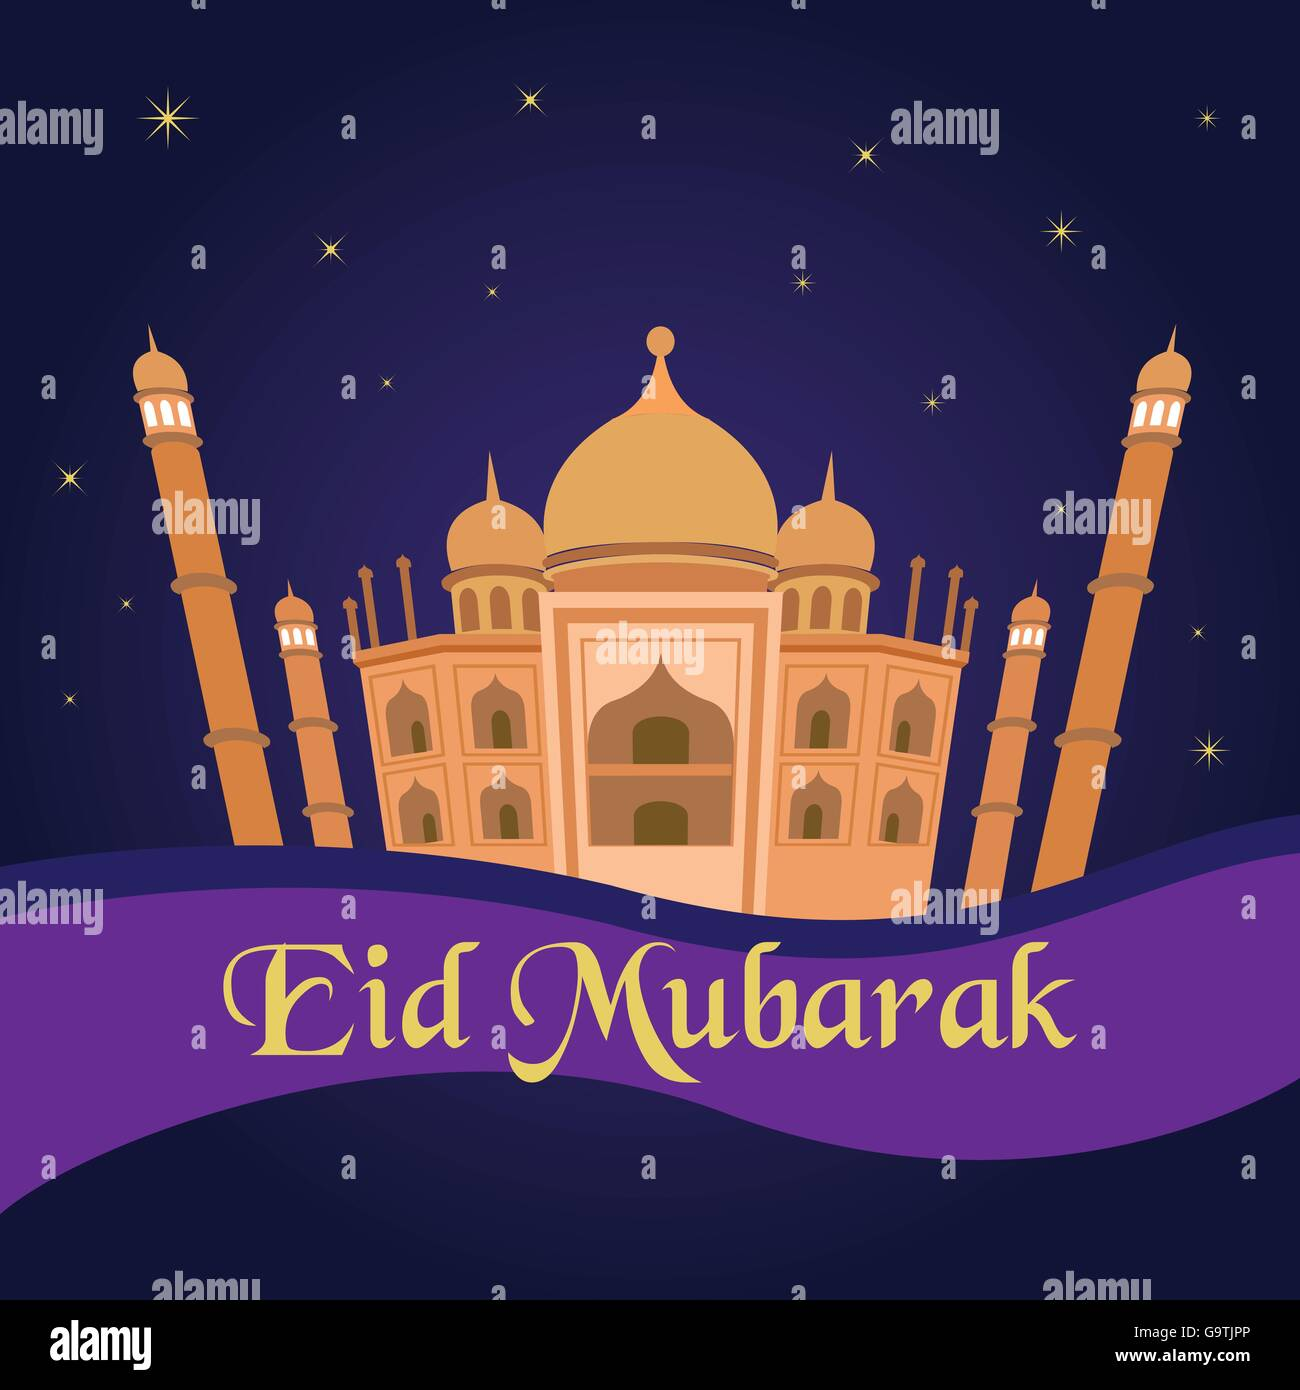 Happy Eid Mubarak Islamic Greetings Stock Photos Happy Eid Mubarak